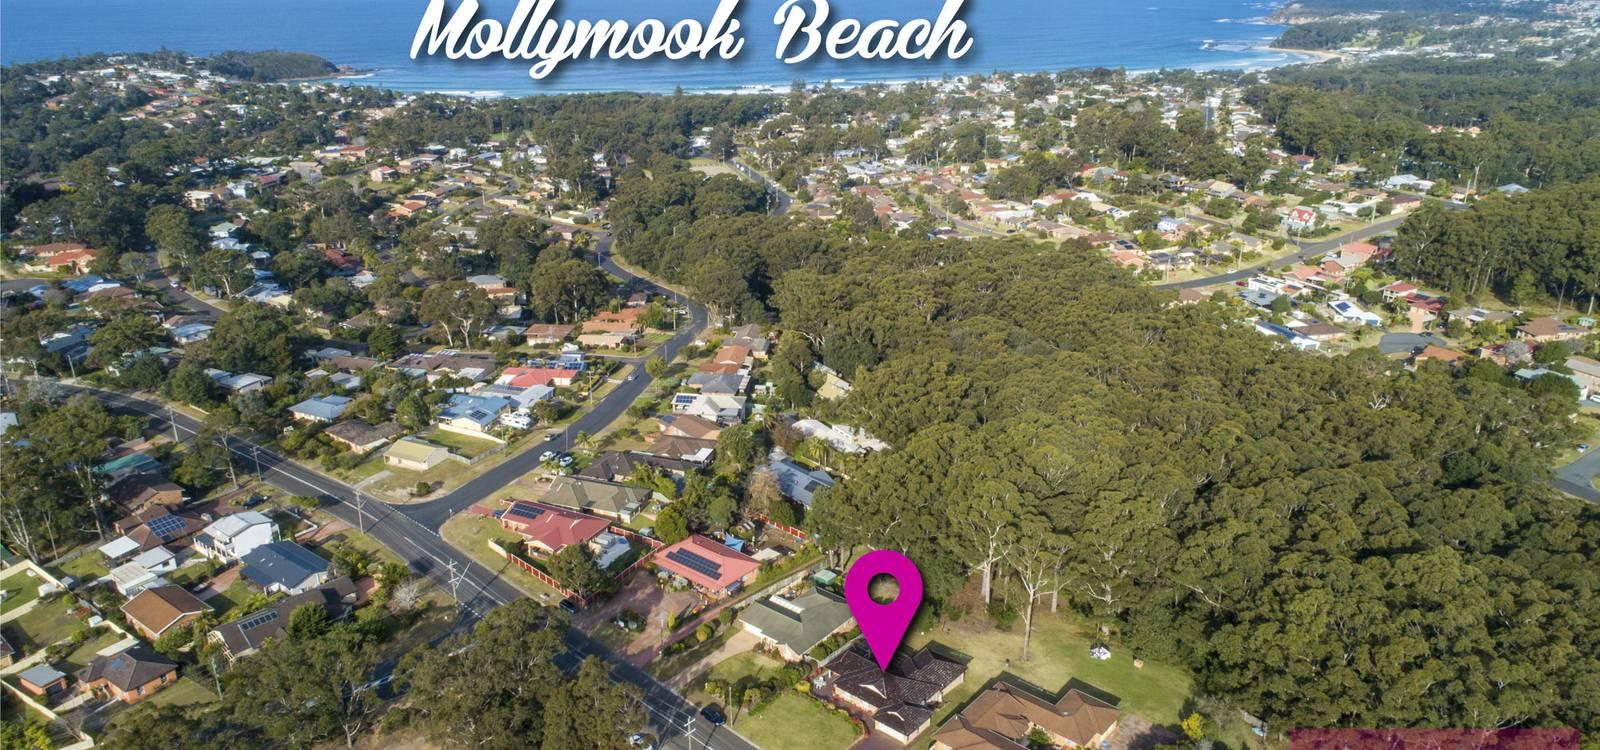 196 Matron Porter Drive MOLLYMOOK BEACH, NSW 2539 - photo 1